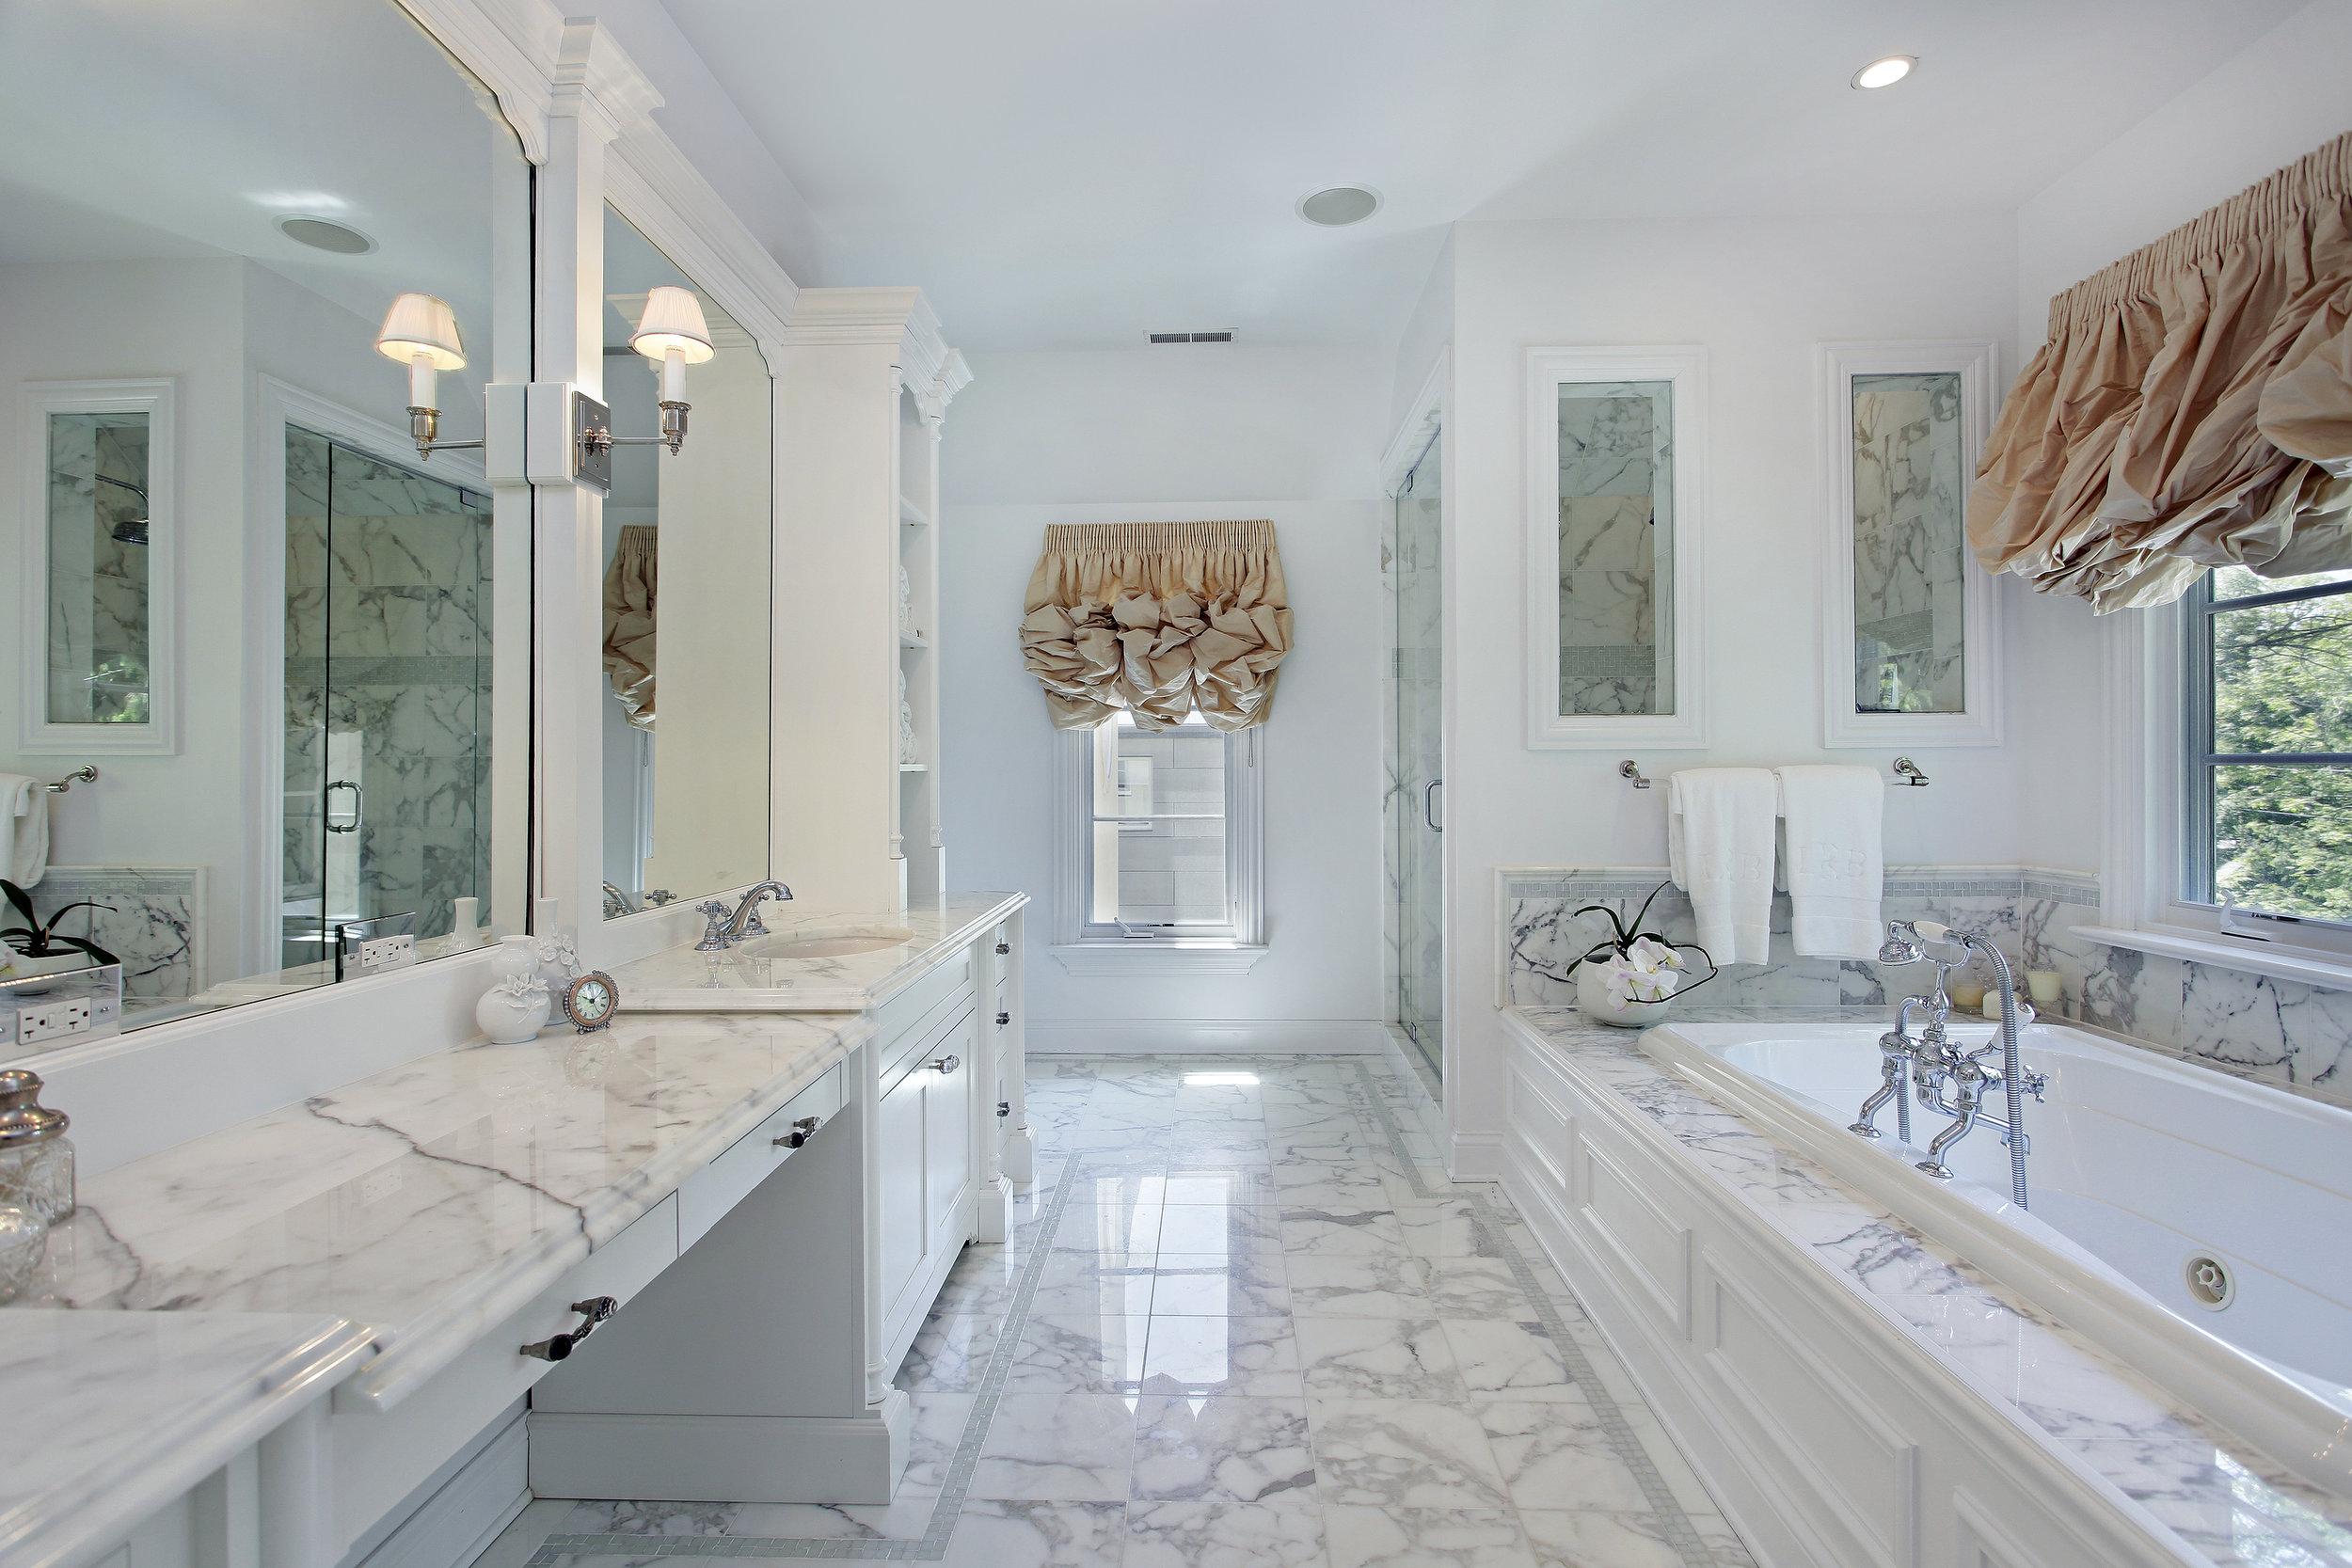 bigstock-Master-bath-in-luxury-home-wit-75635494.jpg